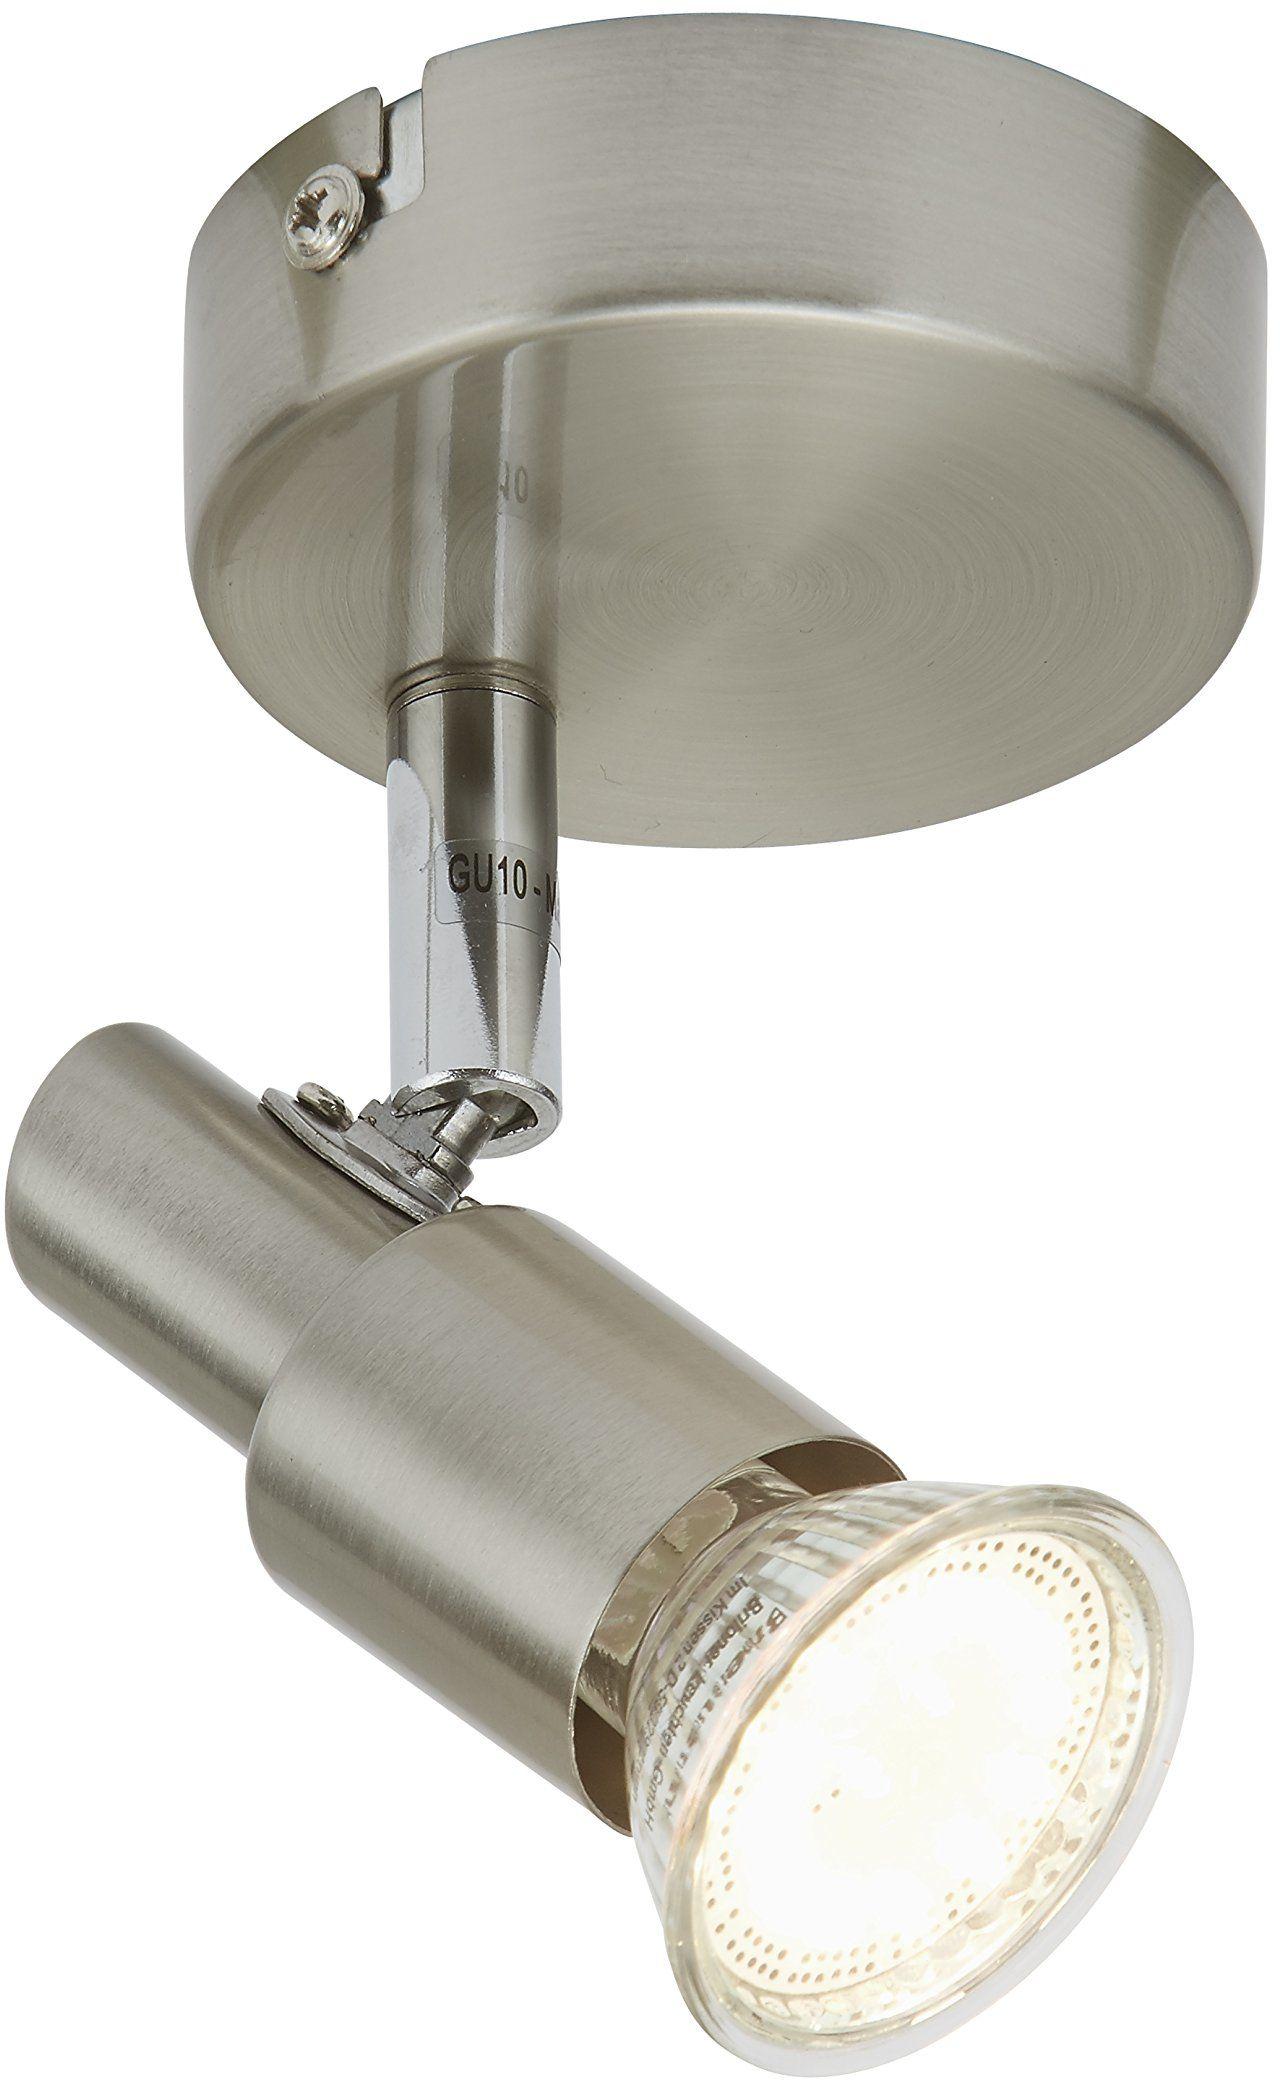 Briloner Leuchten lampa sufitowa, lampa LED, lampa ścienna, reflektor LED, lampa sufitowa, lampa sufitowa, oświetlenie punktowe, lampa sufitowa, do salonu, lampa sufitowa, lampa sufitowa